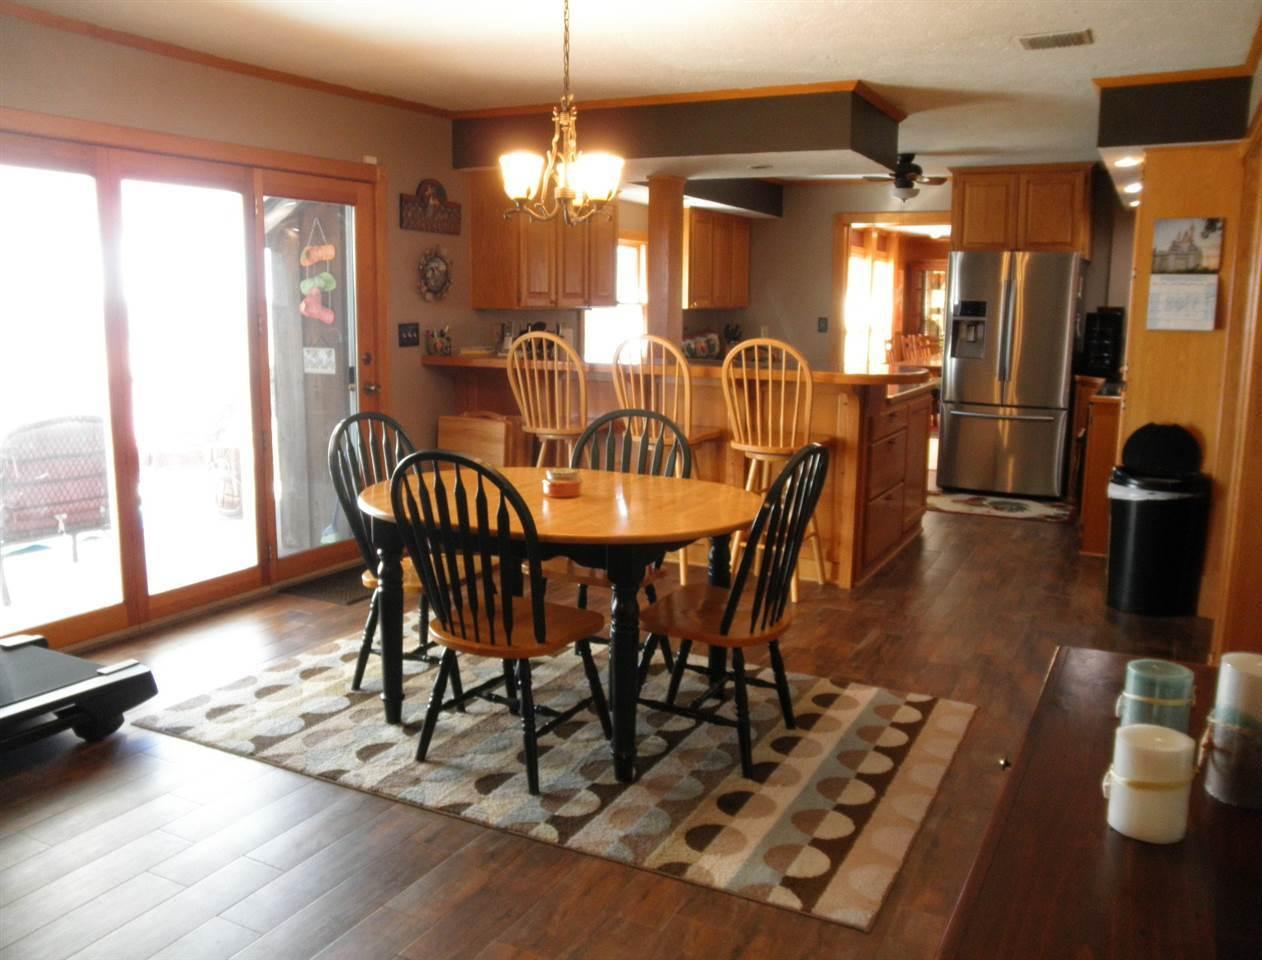 Sold Intraoffice W/MLS | 7038 River Ridge Drive  Ponca City, OK 74604 9